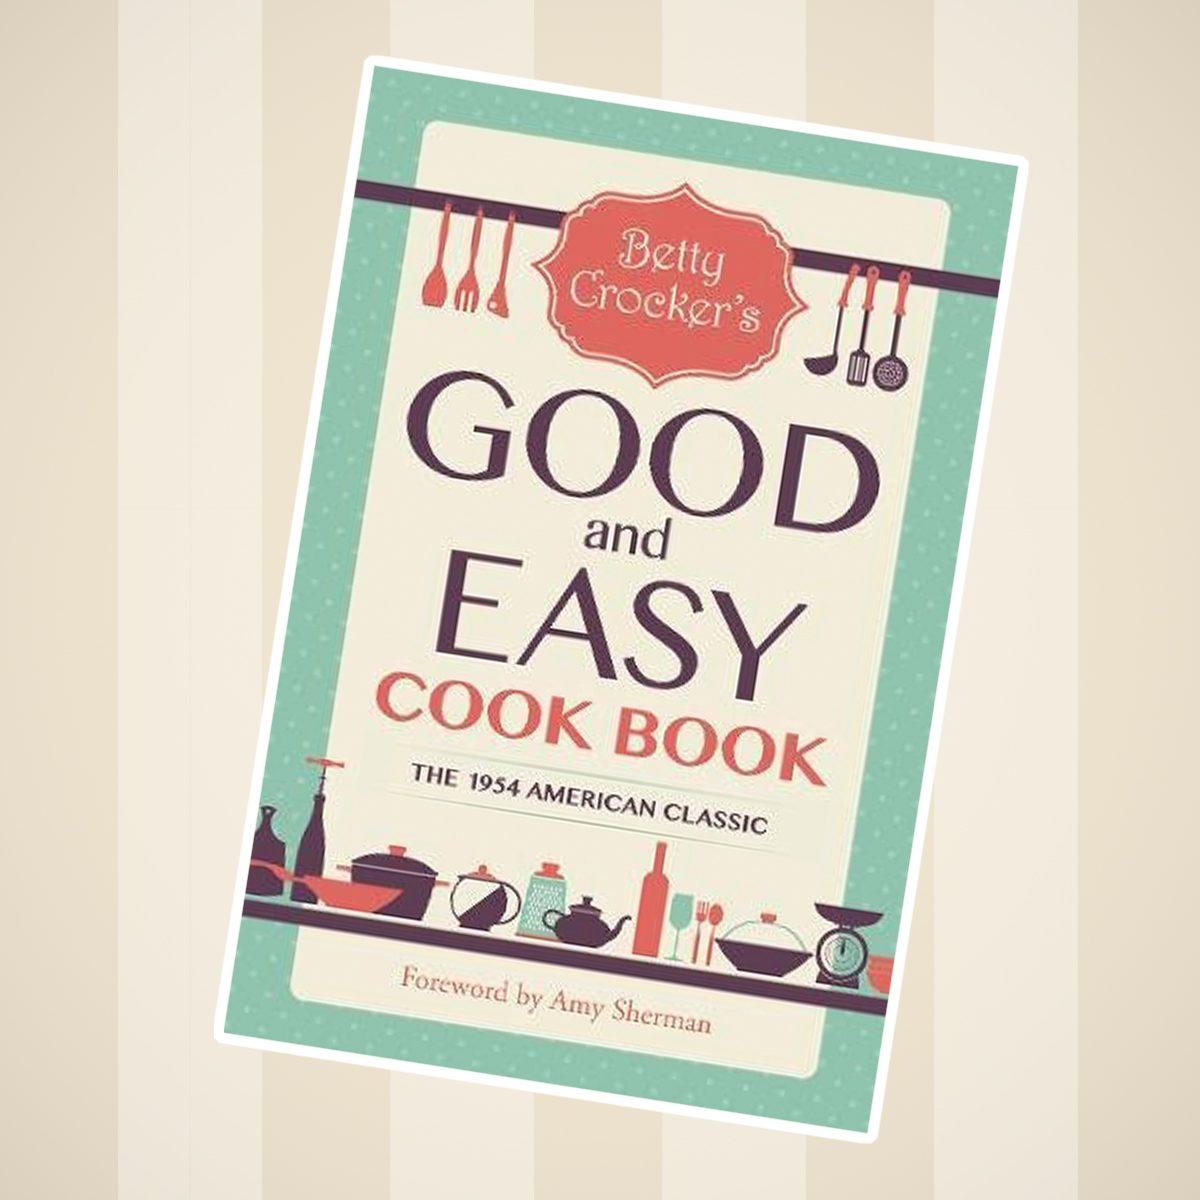 Betty Crocker's Good and Easy Cookbook